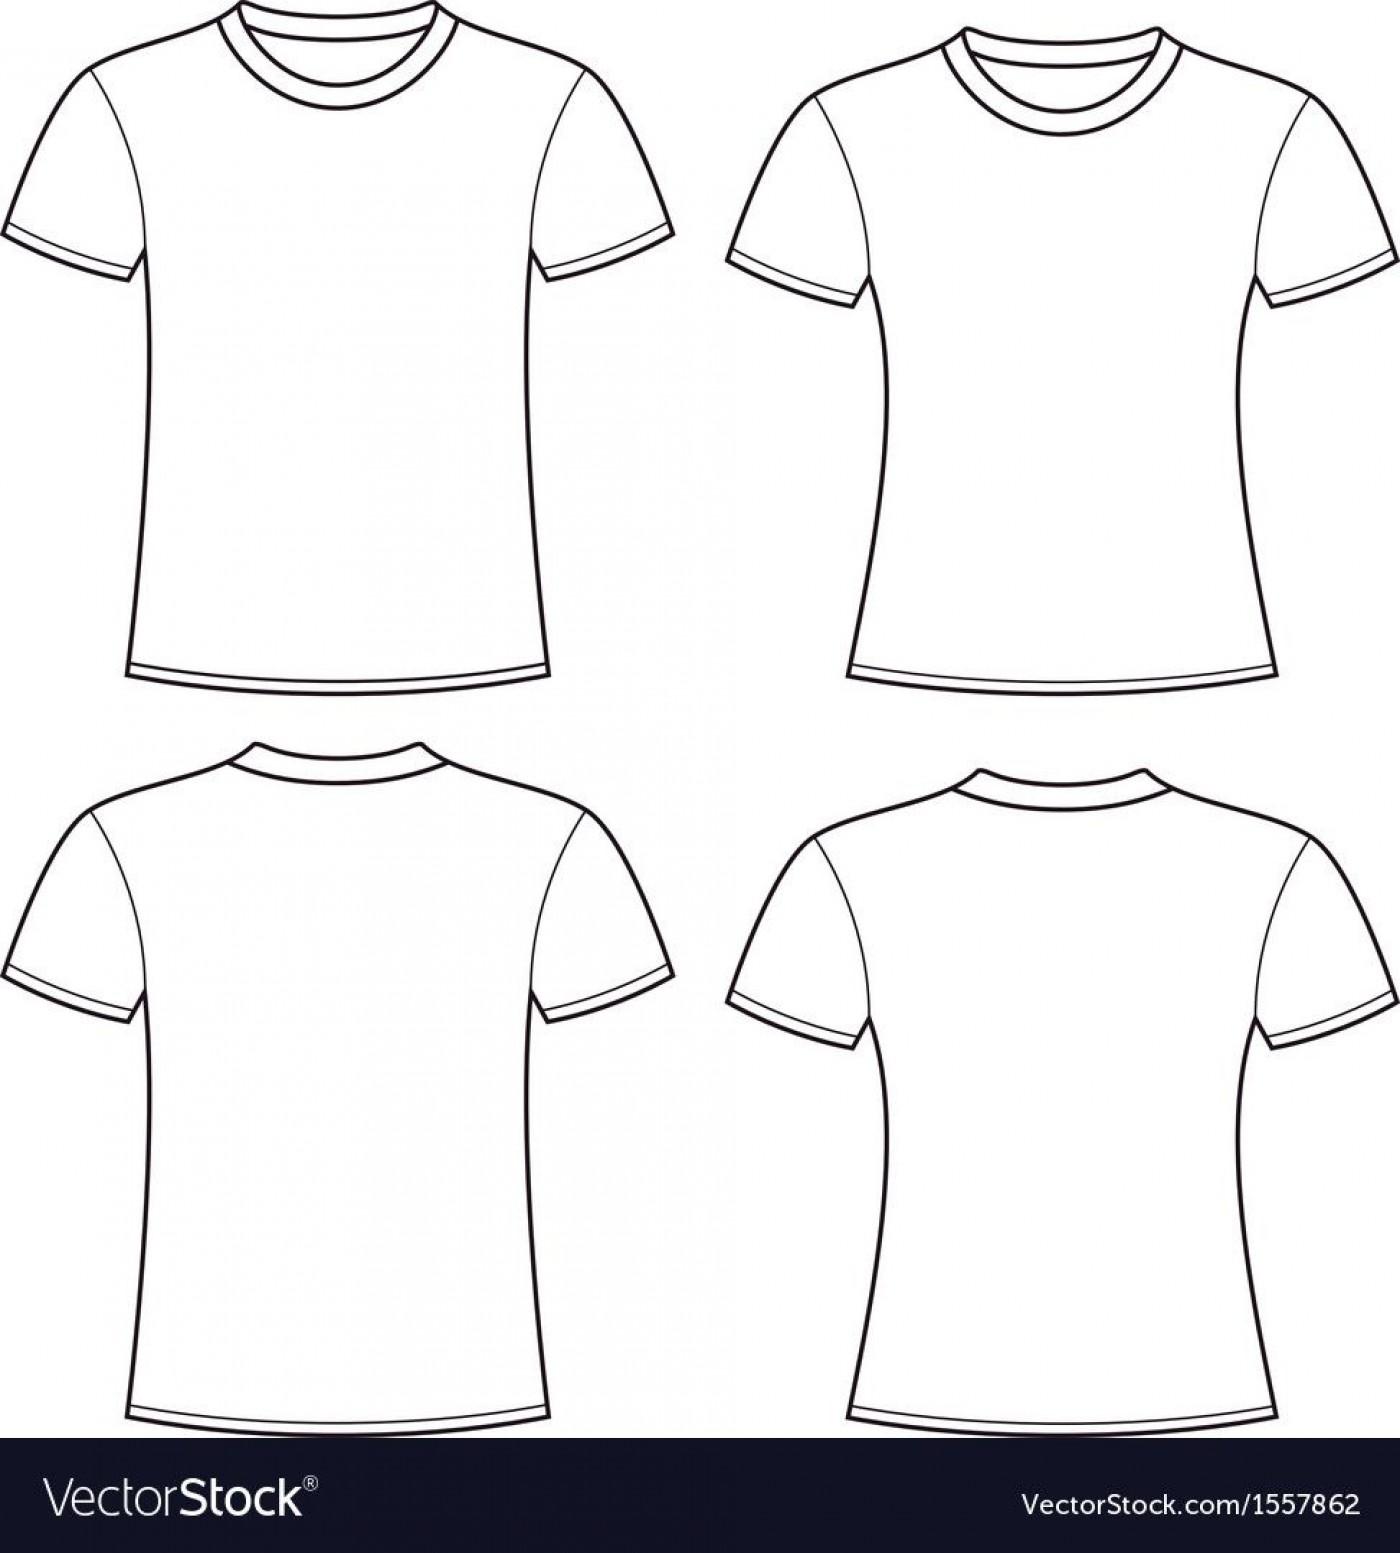 004 Impressive T Shirt Template Free High Definition  White Psd Download Design Website1400